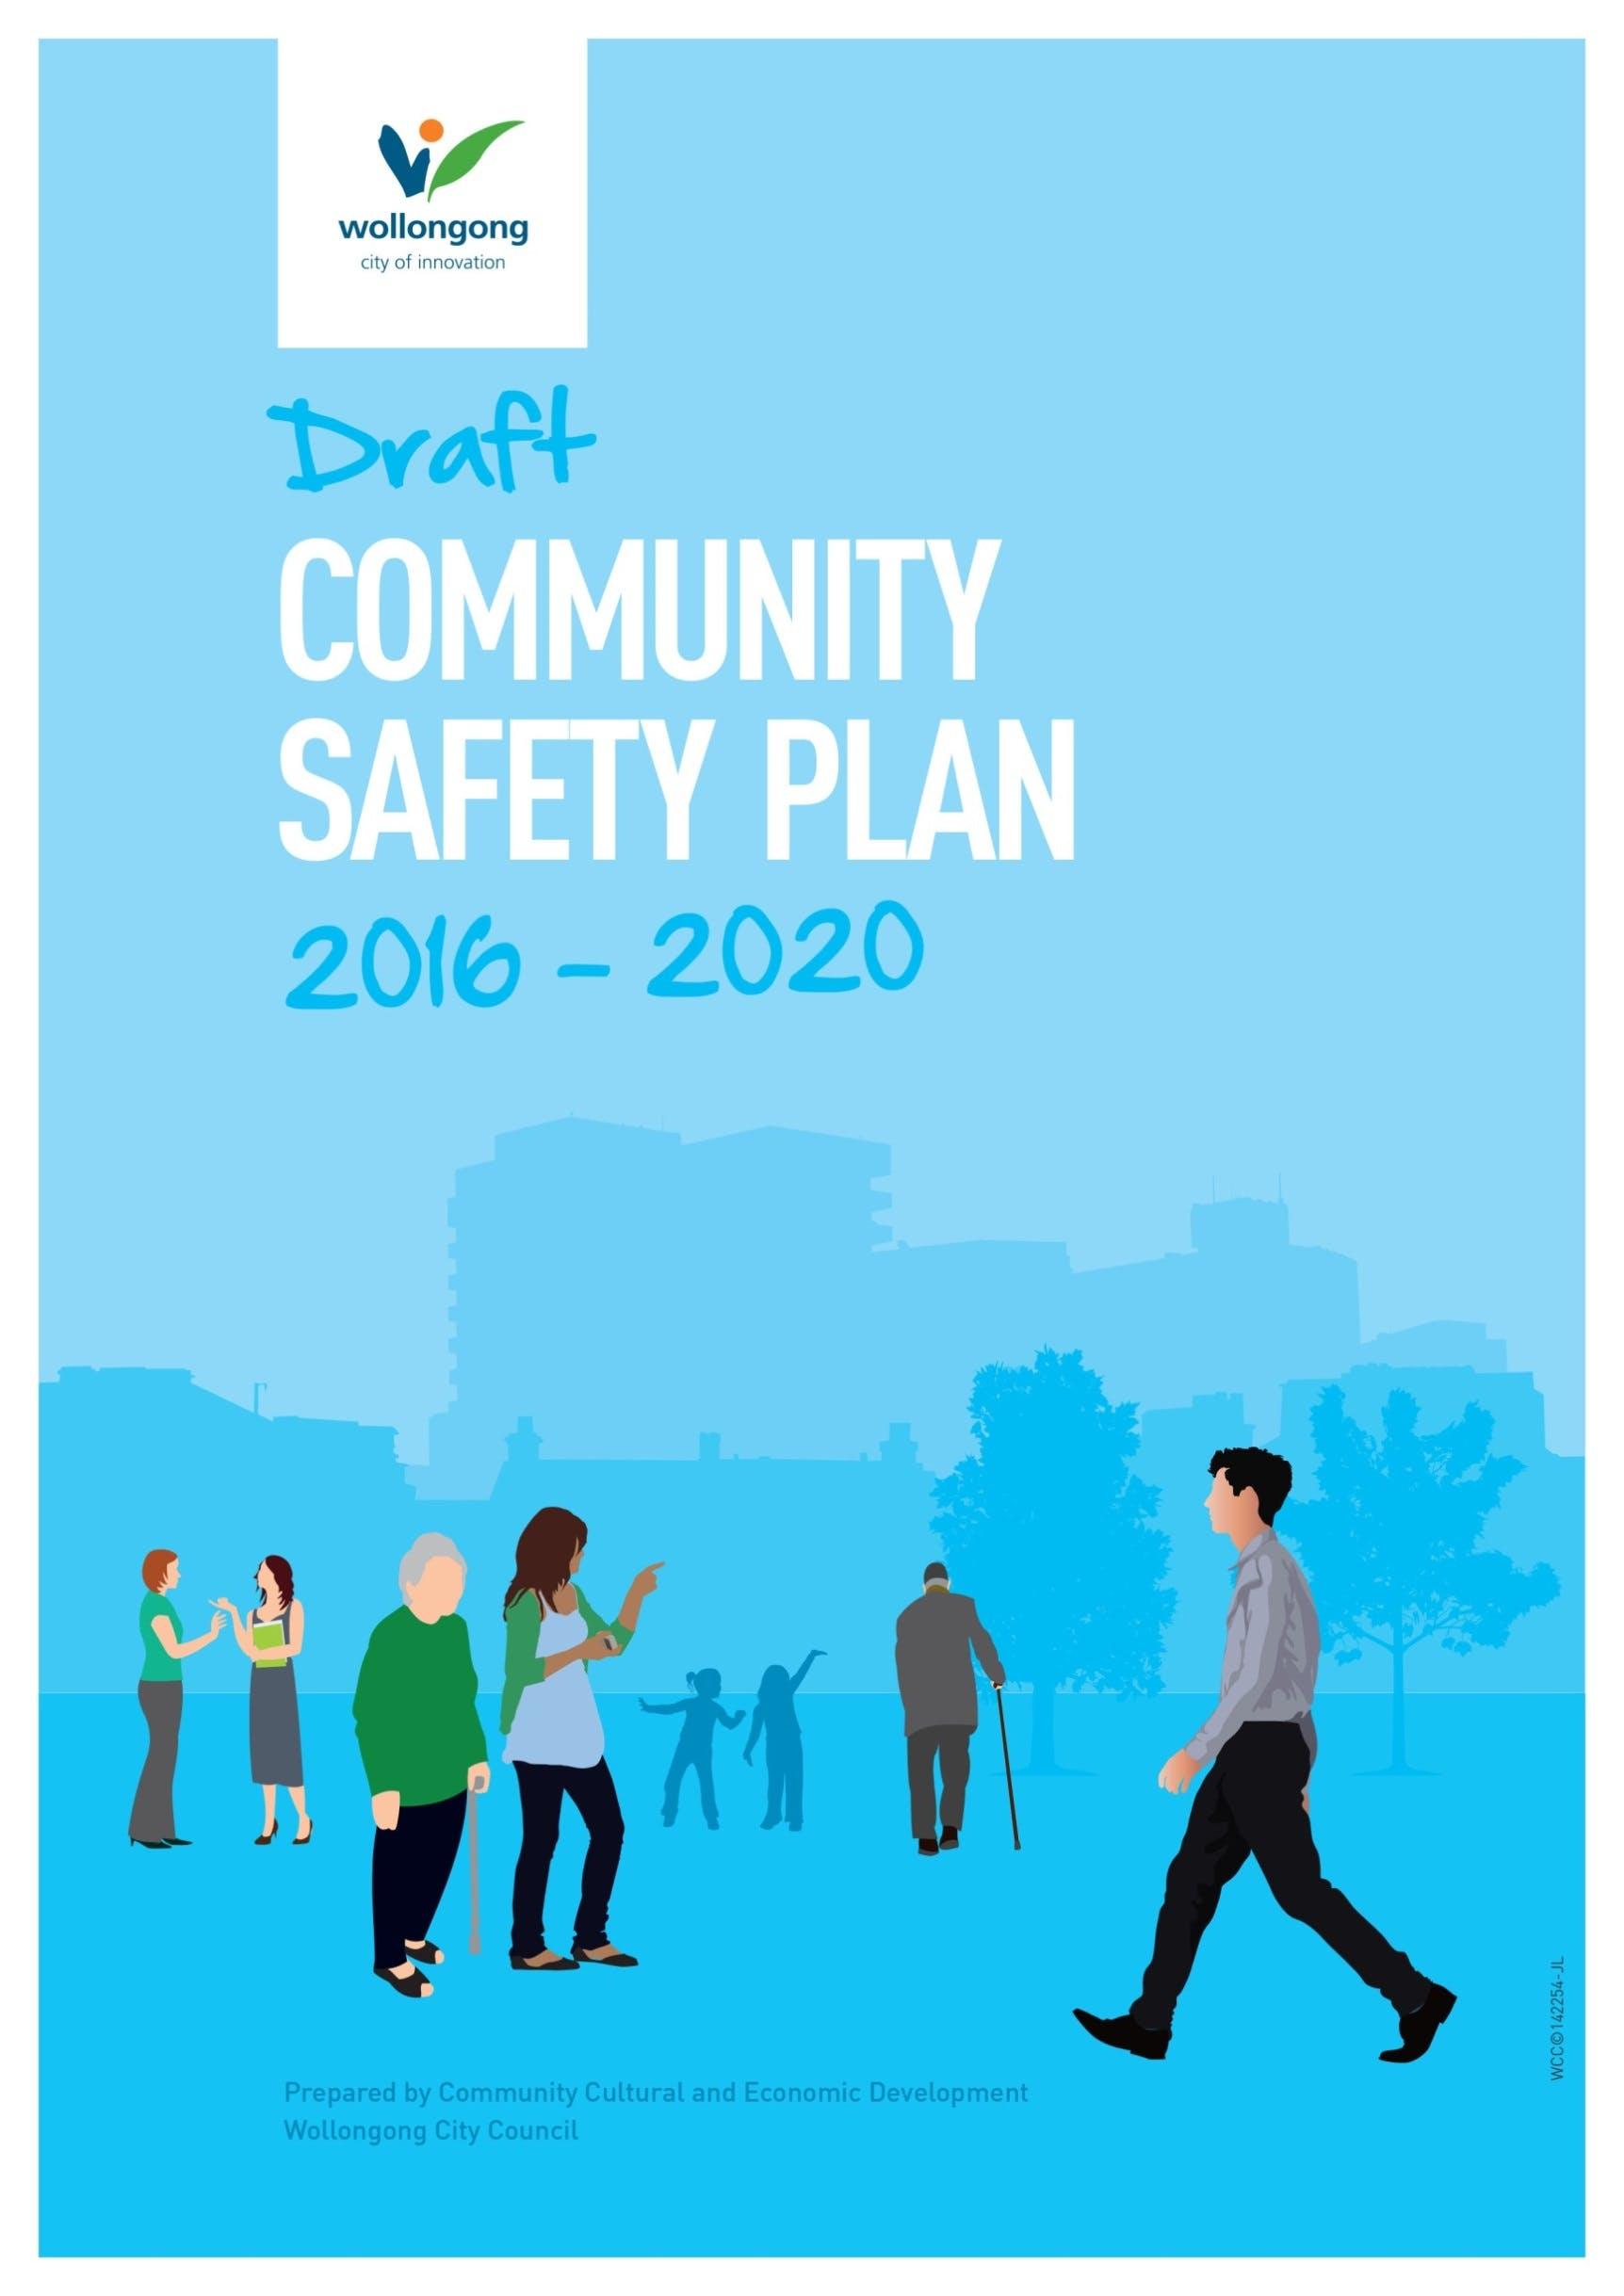 Draft communit safety plan 2016 2020